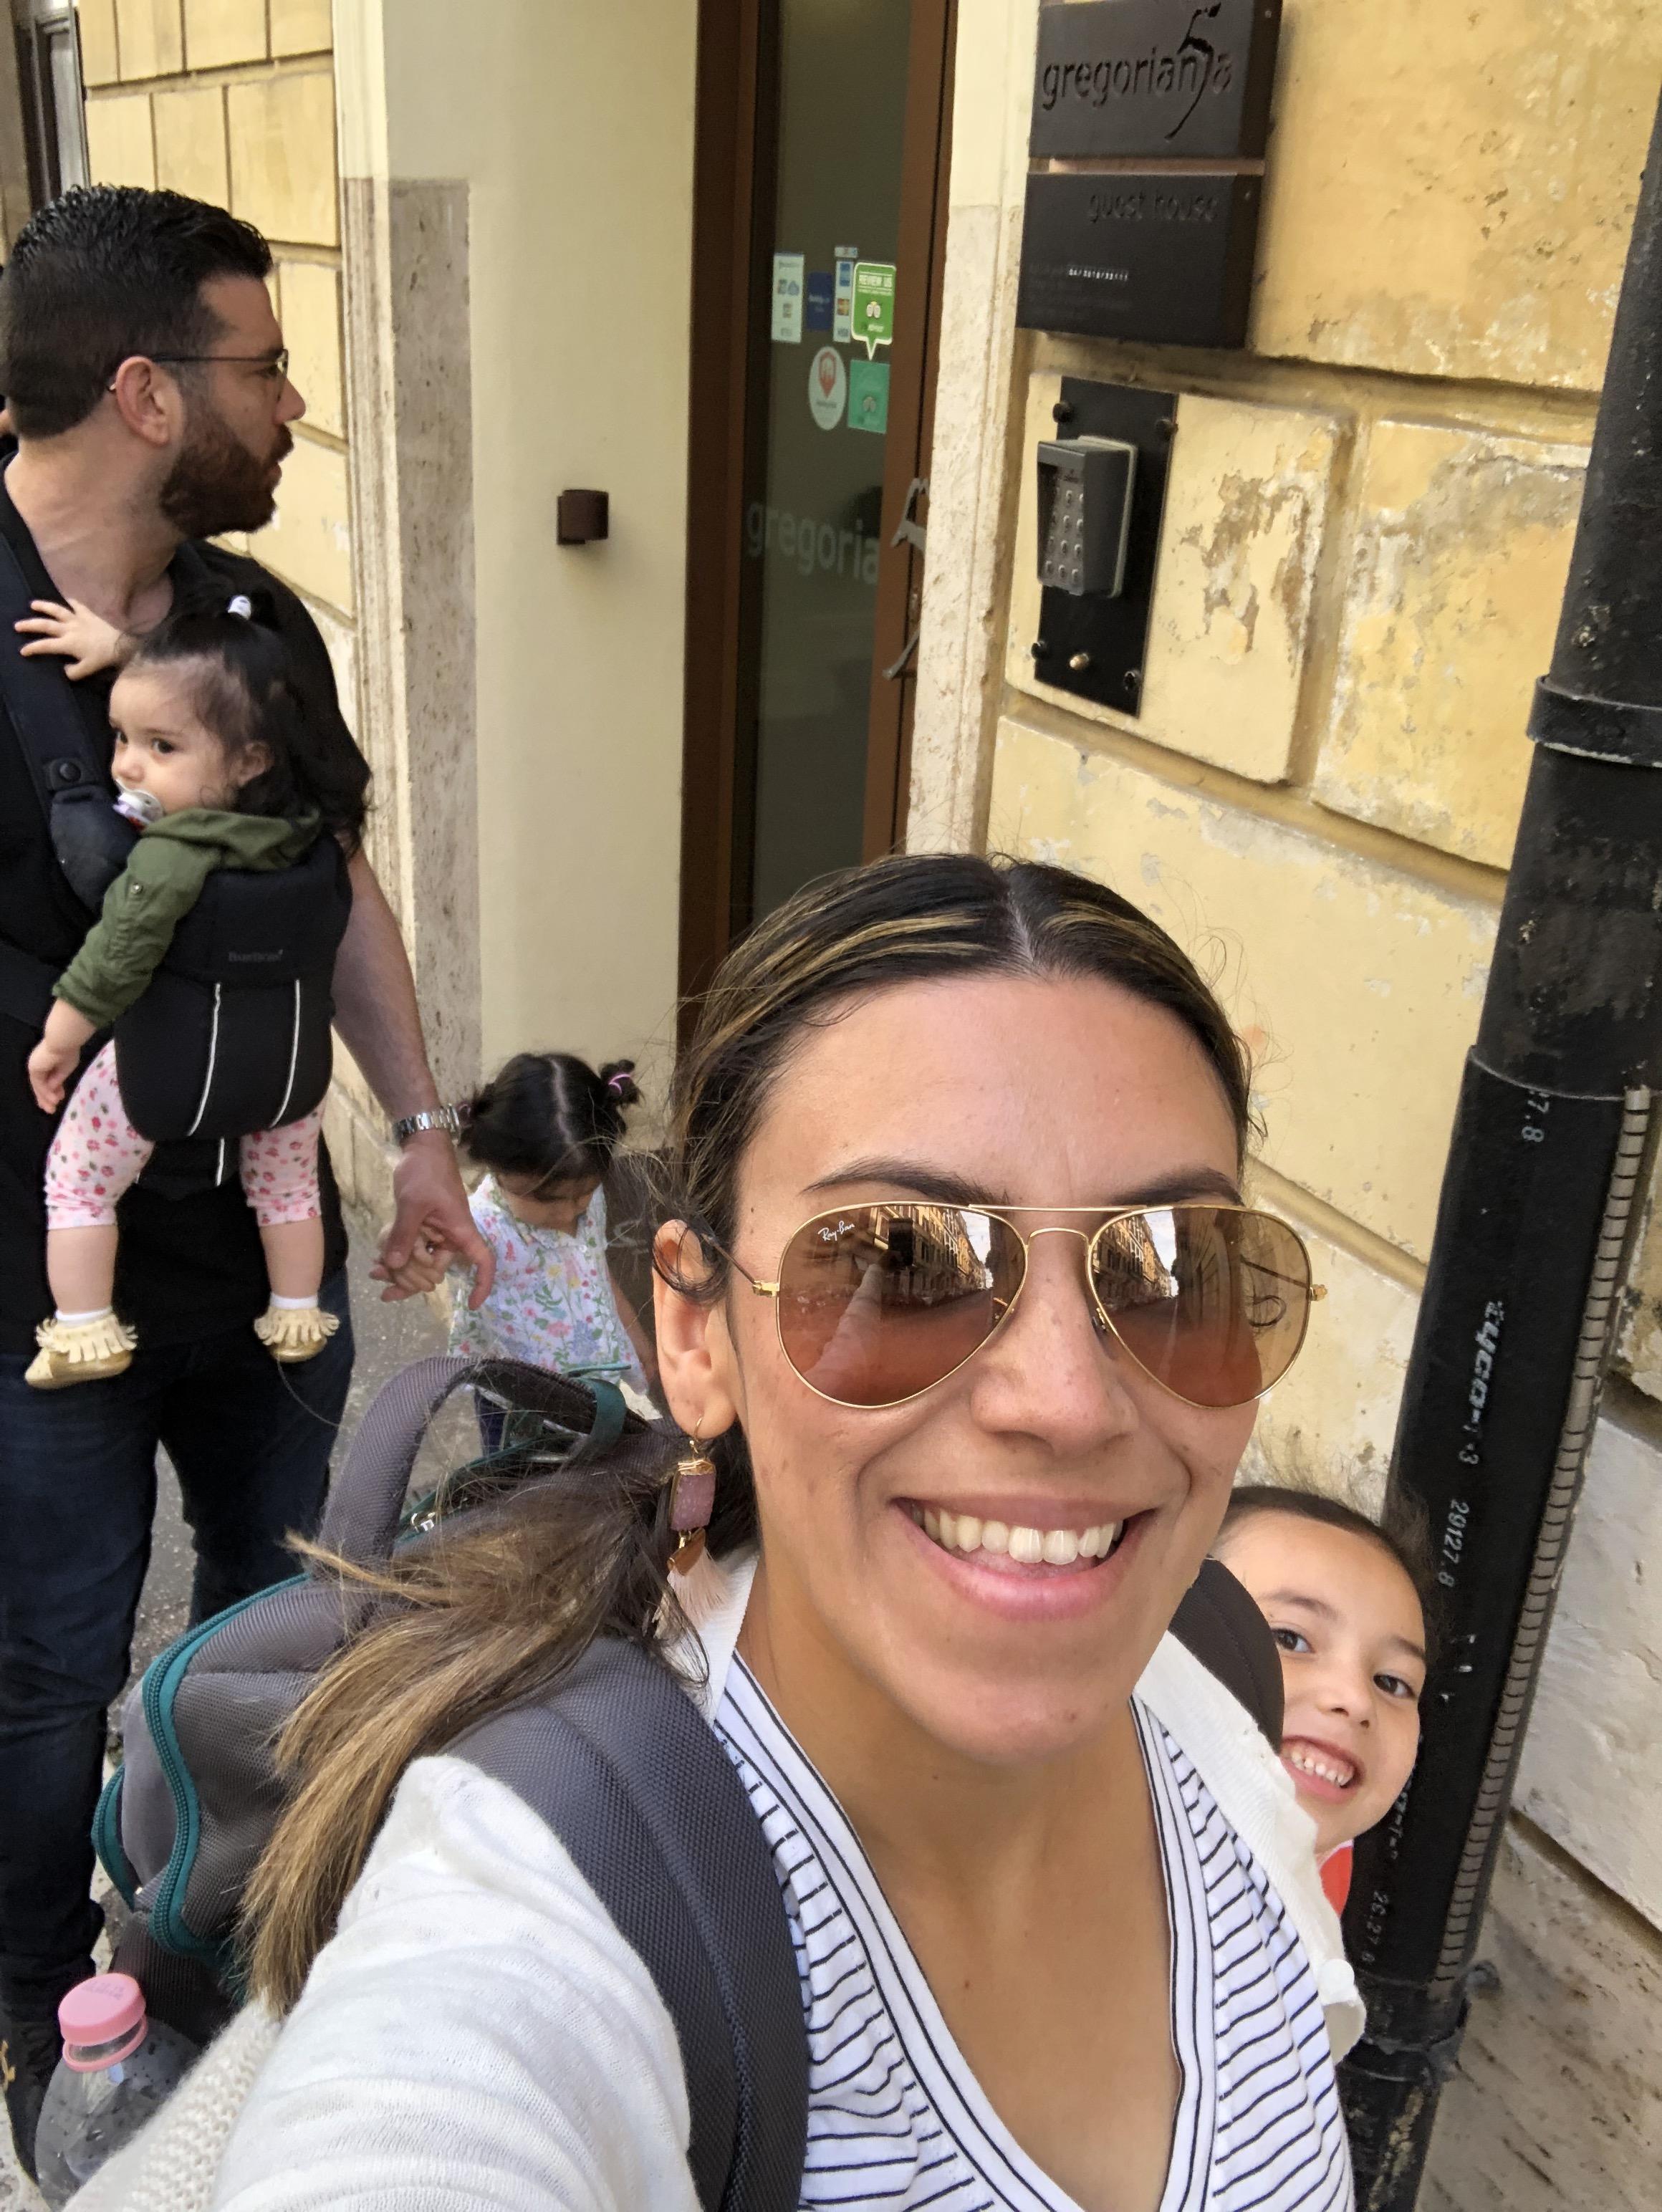 Paris, turning 30, 30th birthday, Paris, Europe, Rome, travel, travel blog, faith blog